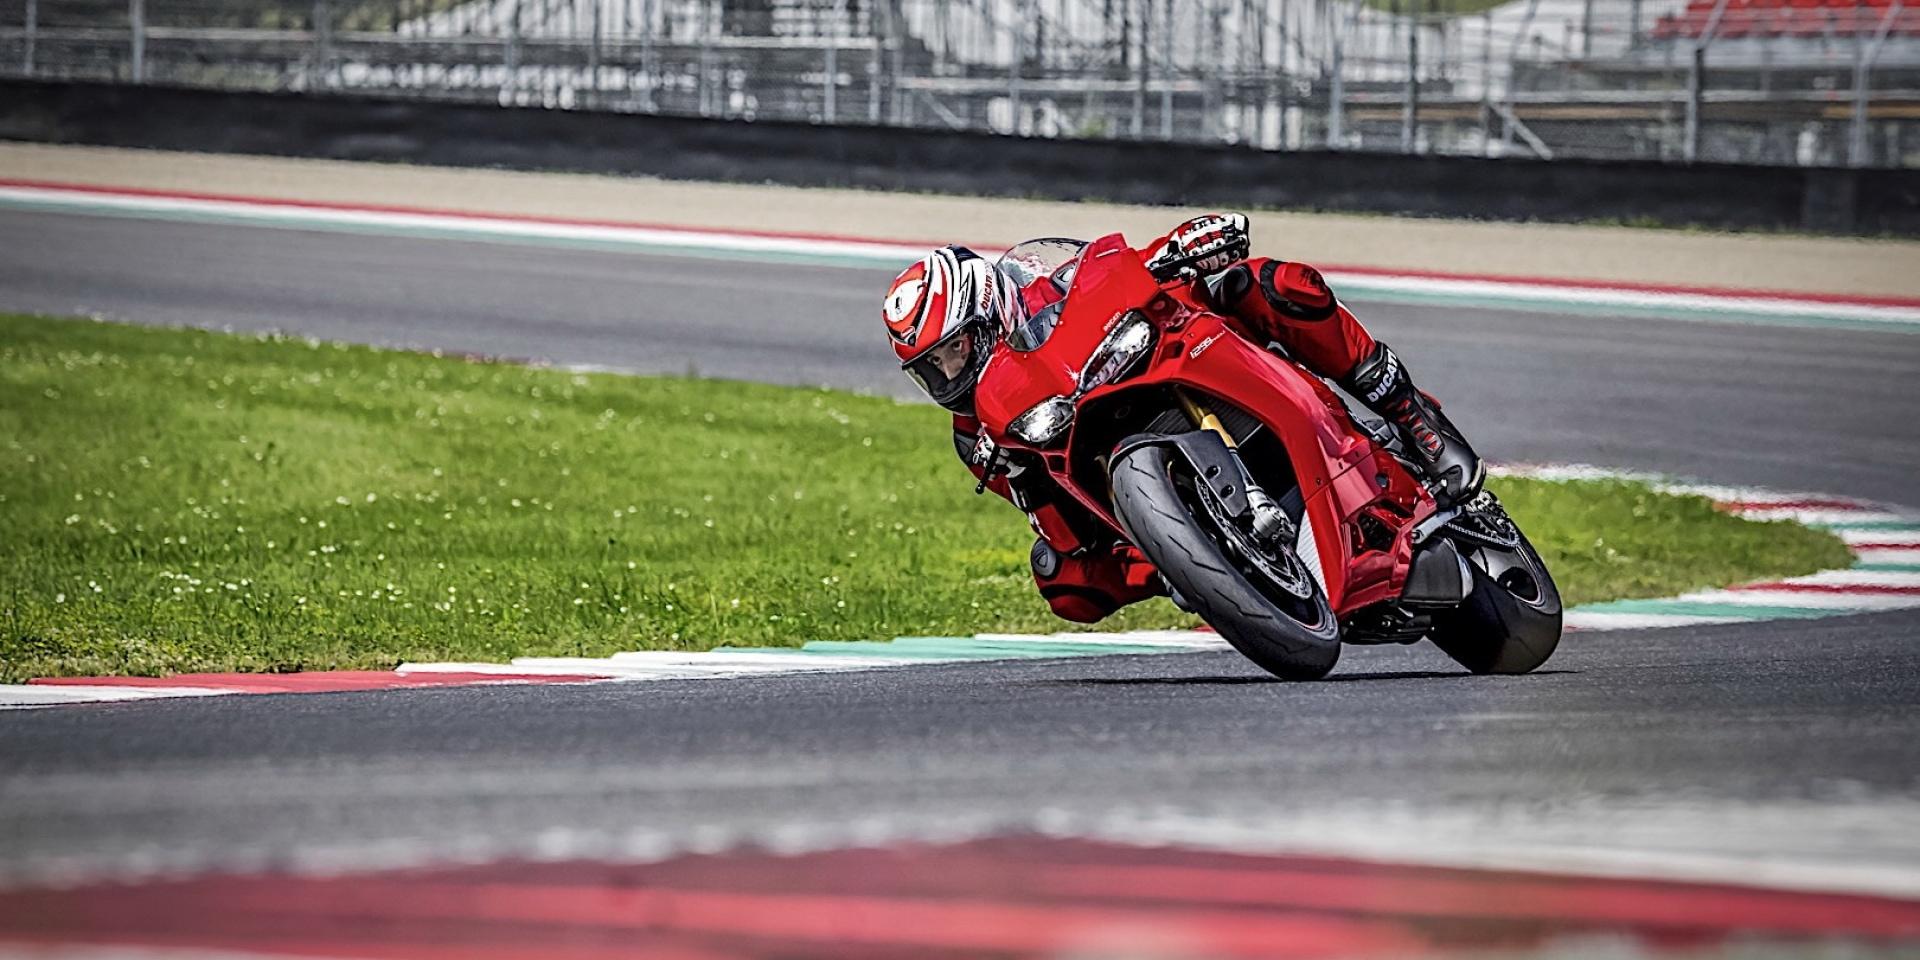 Ducati 1299 Panigale的舊車友們有福了,DTC EVO循跡系統可升級搭載